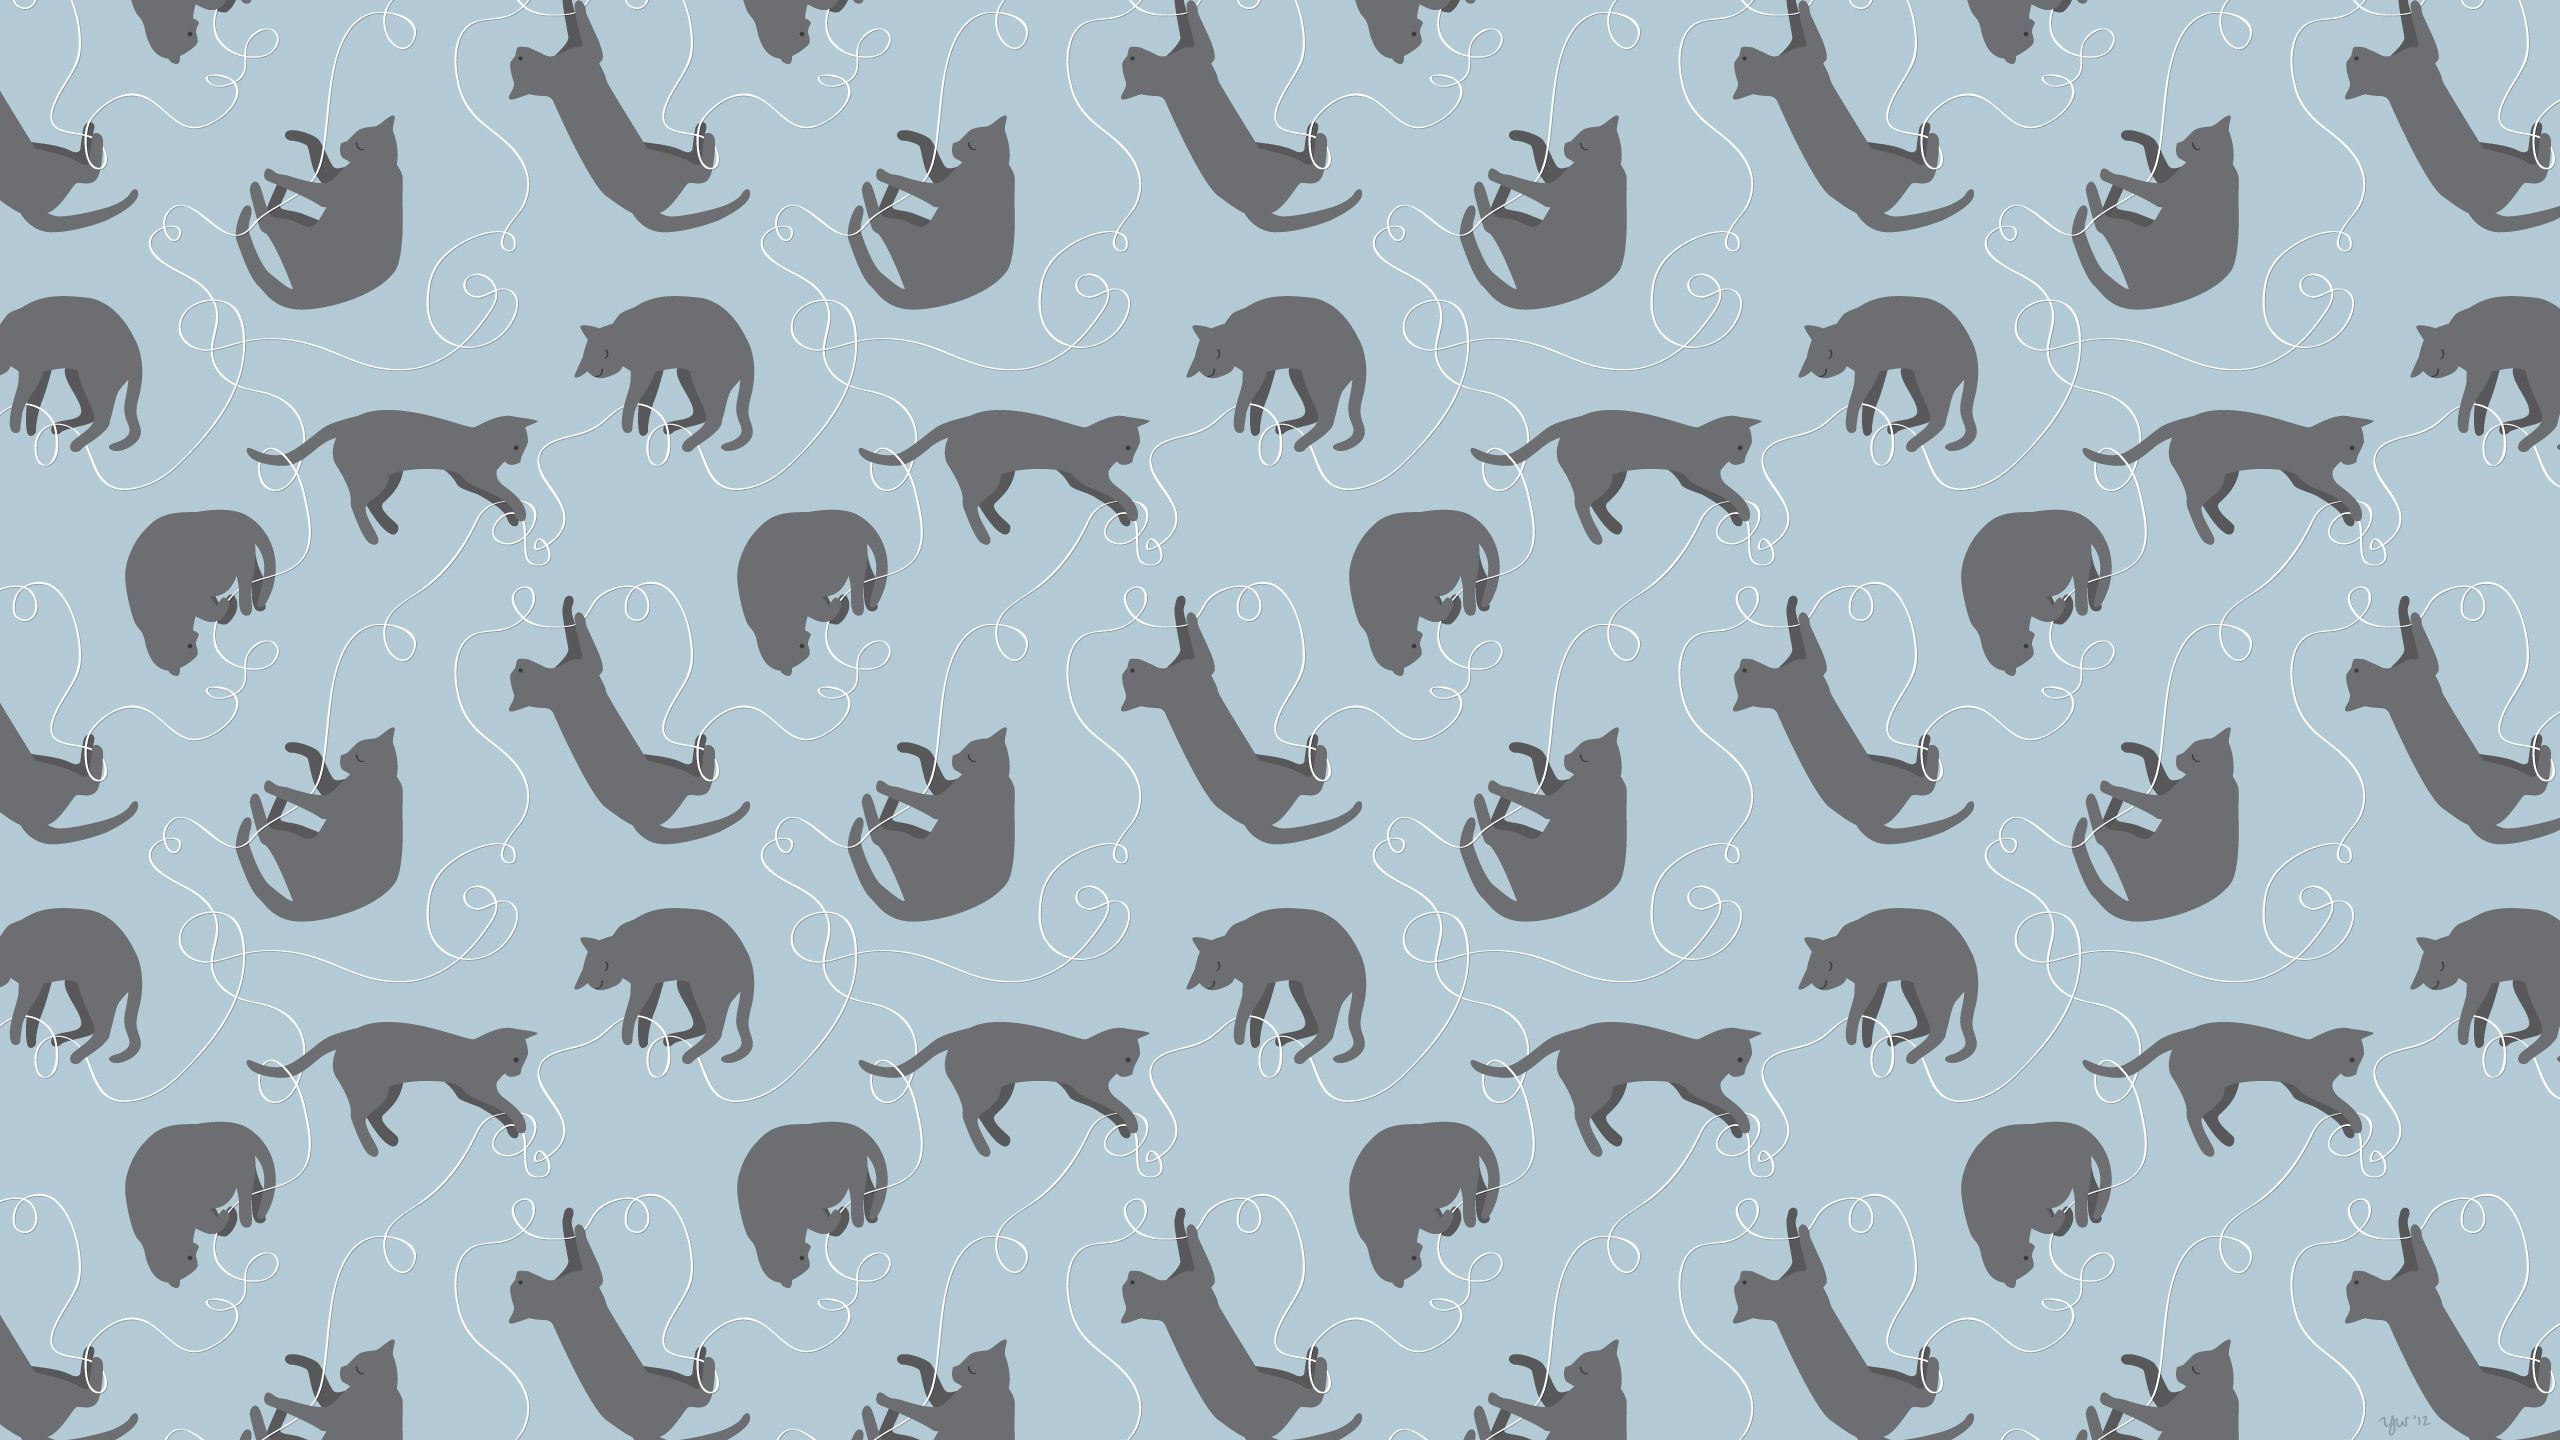 yvonnewengcatblue2560x1440.jpg (2560×1440) Cat pattern